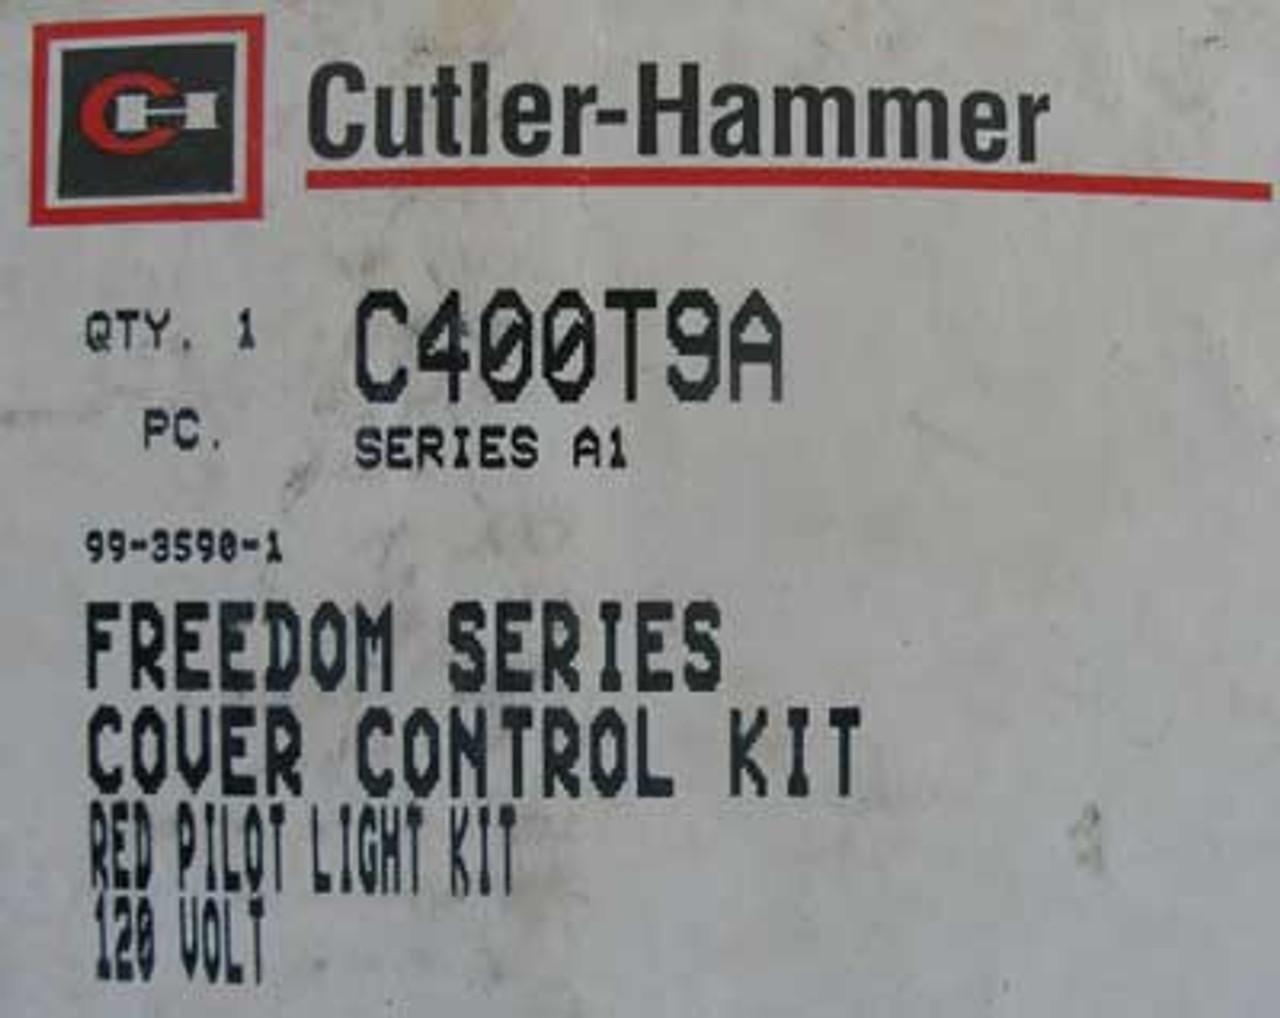 Cutler Hammer C400T9A 120V Red Pilot Light Kit